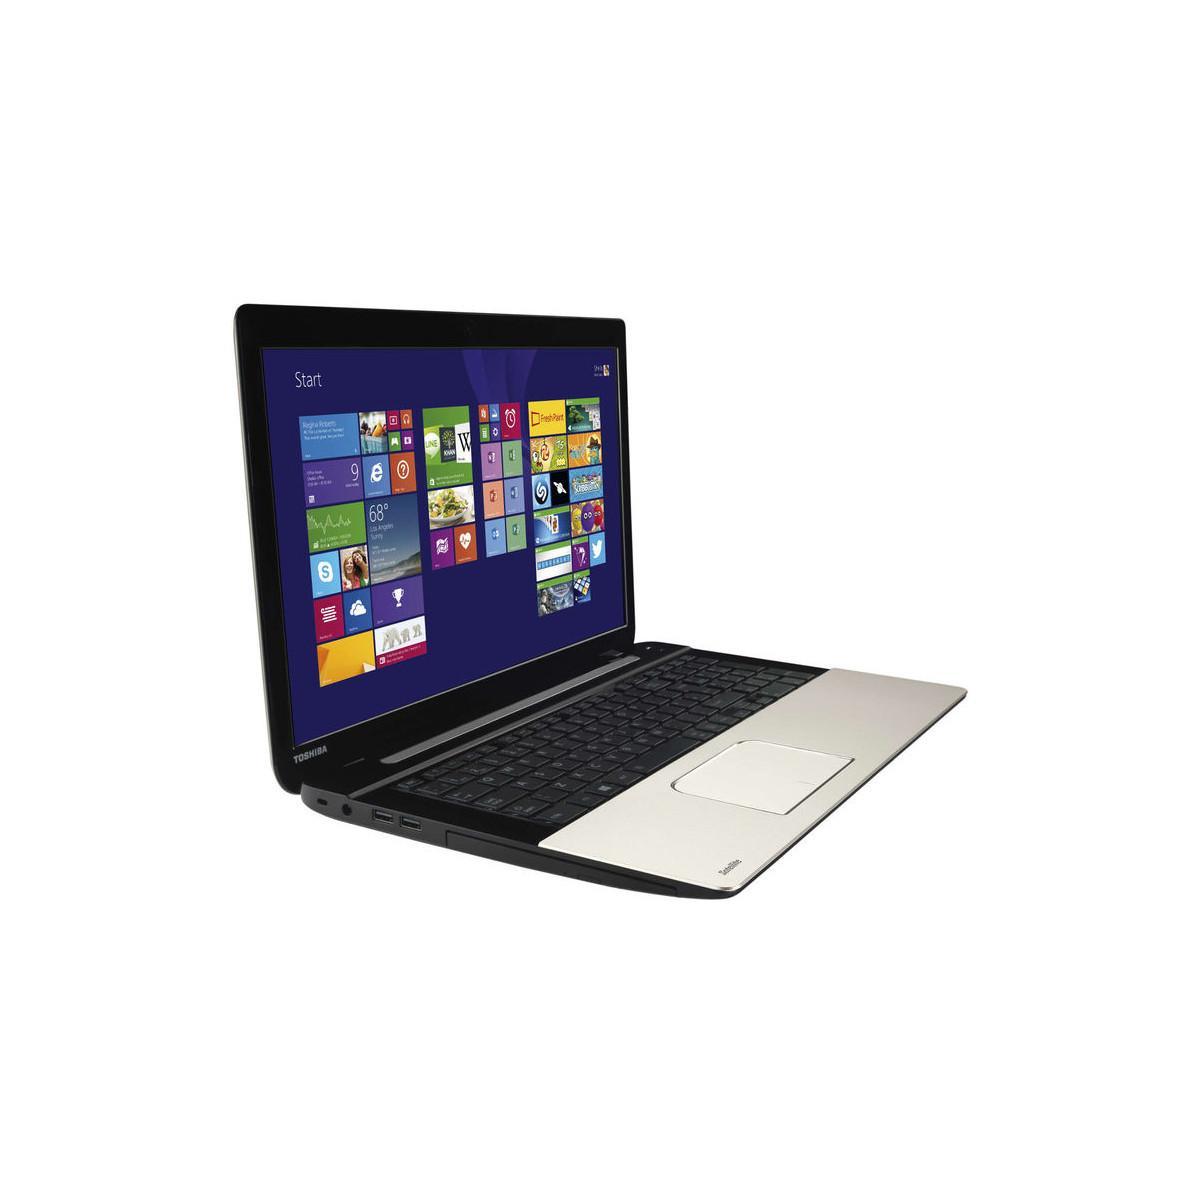 "PC Portable 17.3"" Toshiba Satellite L70-B-10W - Intel i3-4005U, 4 Go de Ram, 750 Go, AMD Radeon R7 M260"